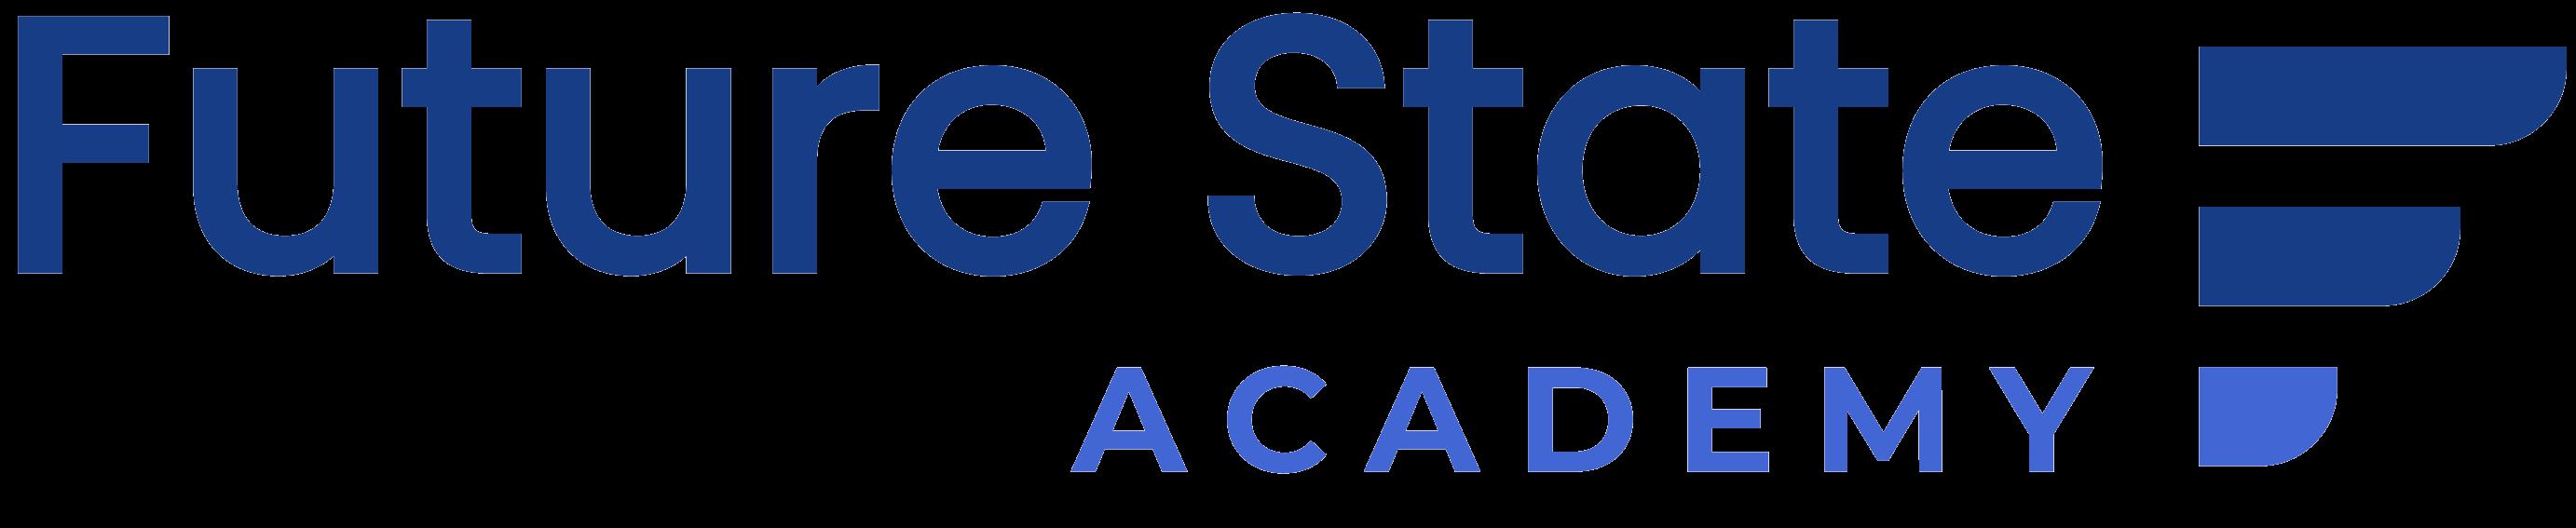 Future State Academy